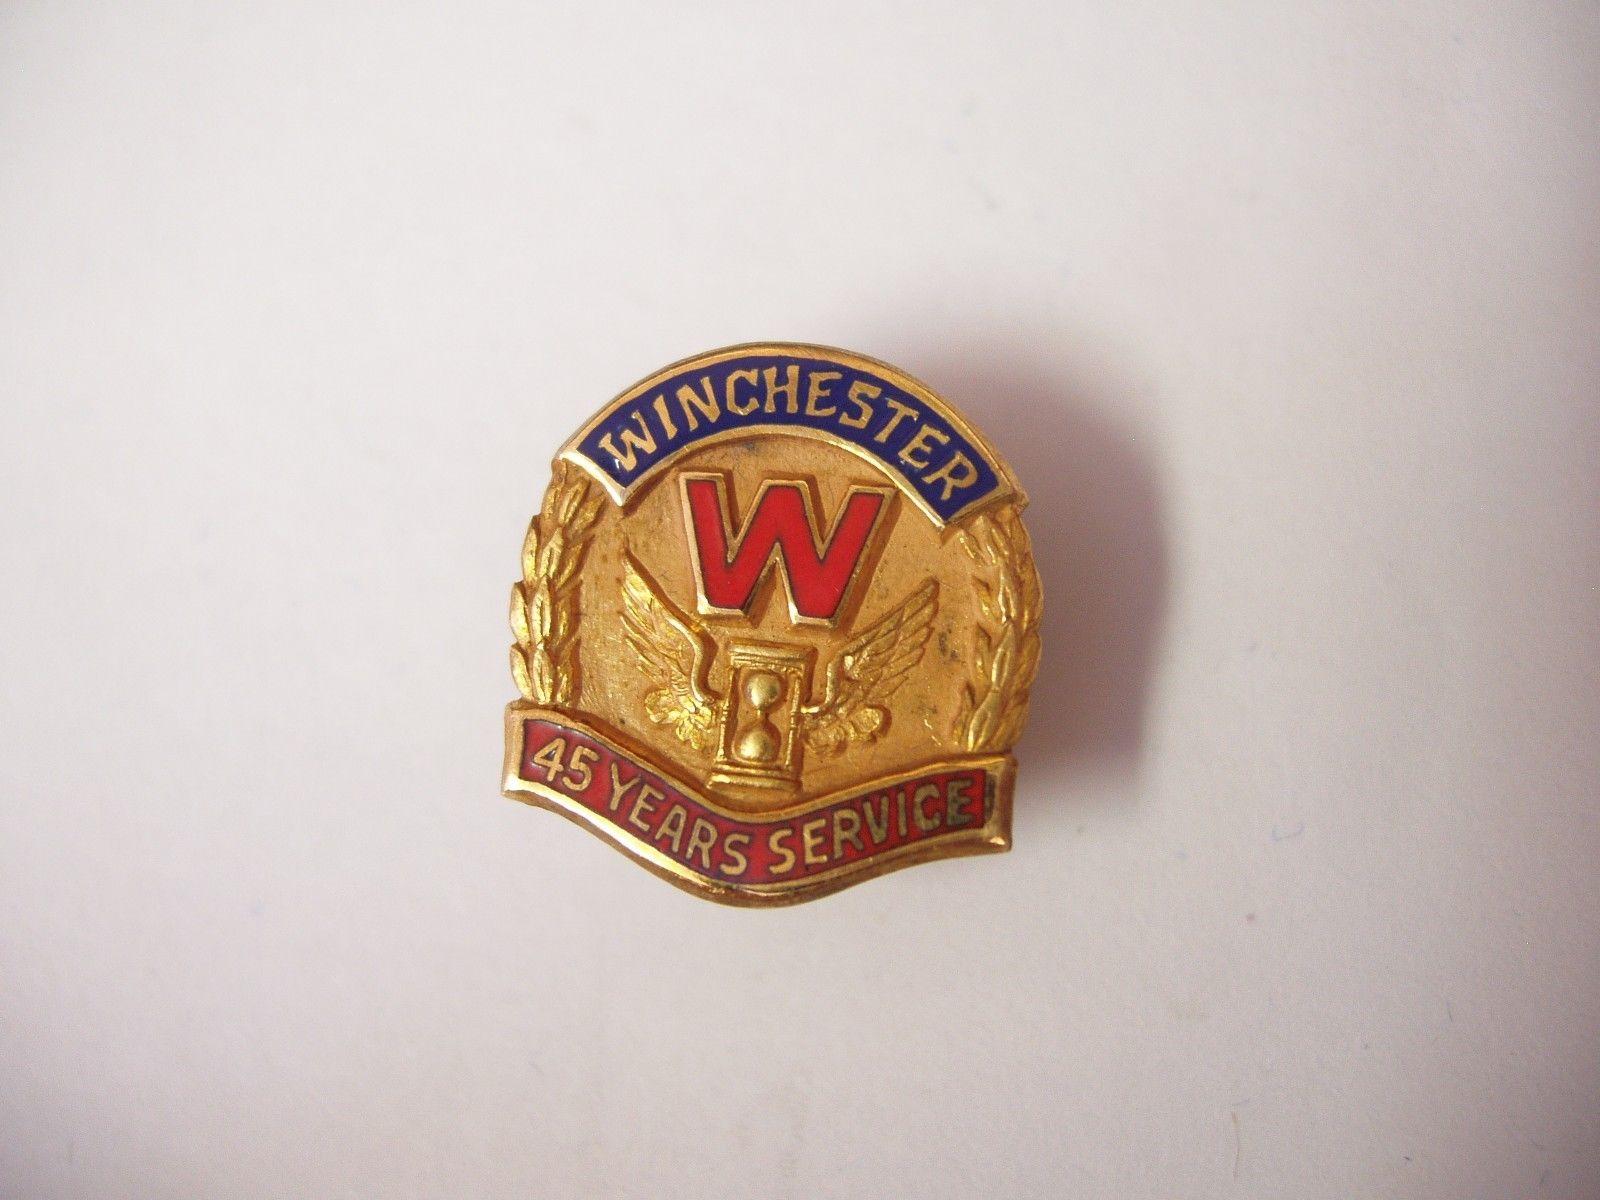 Winchester-Service-Badge-45-Years-.JPG